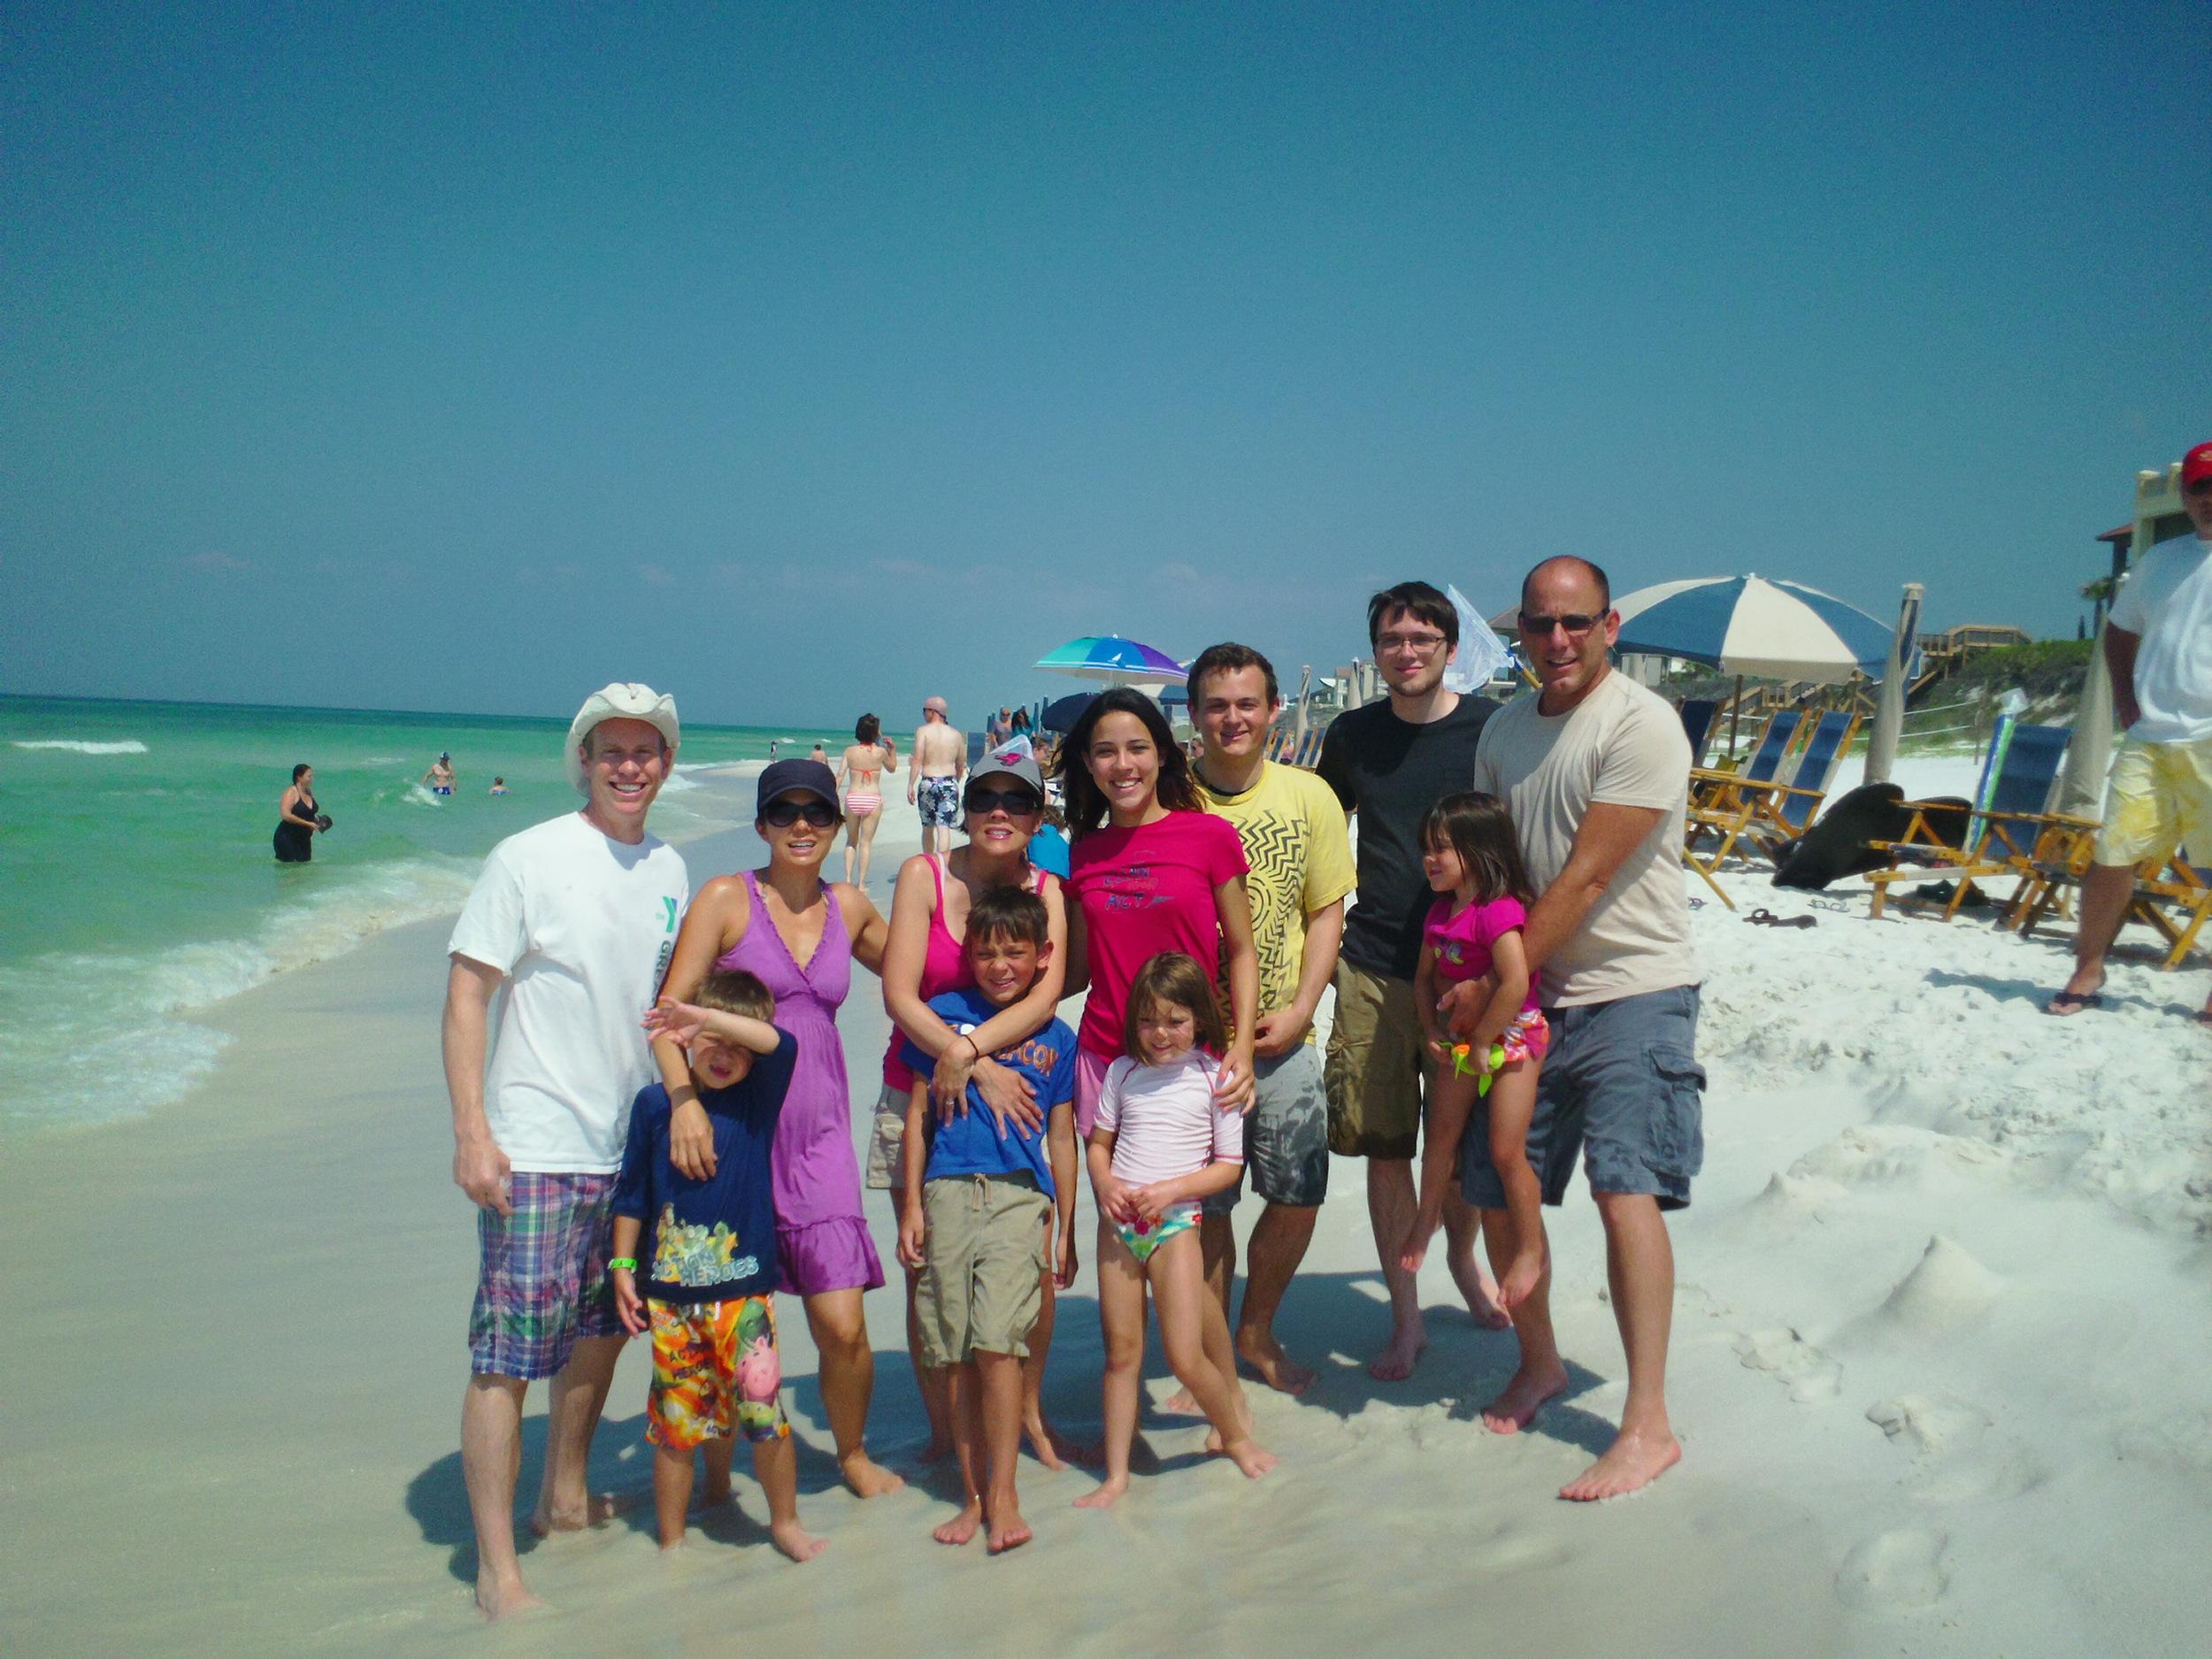 Family at Beach with Granny.JPG